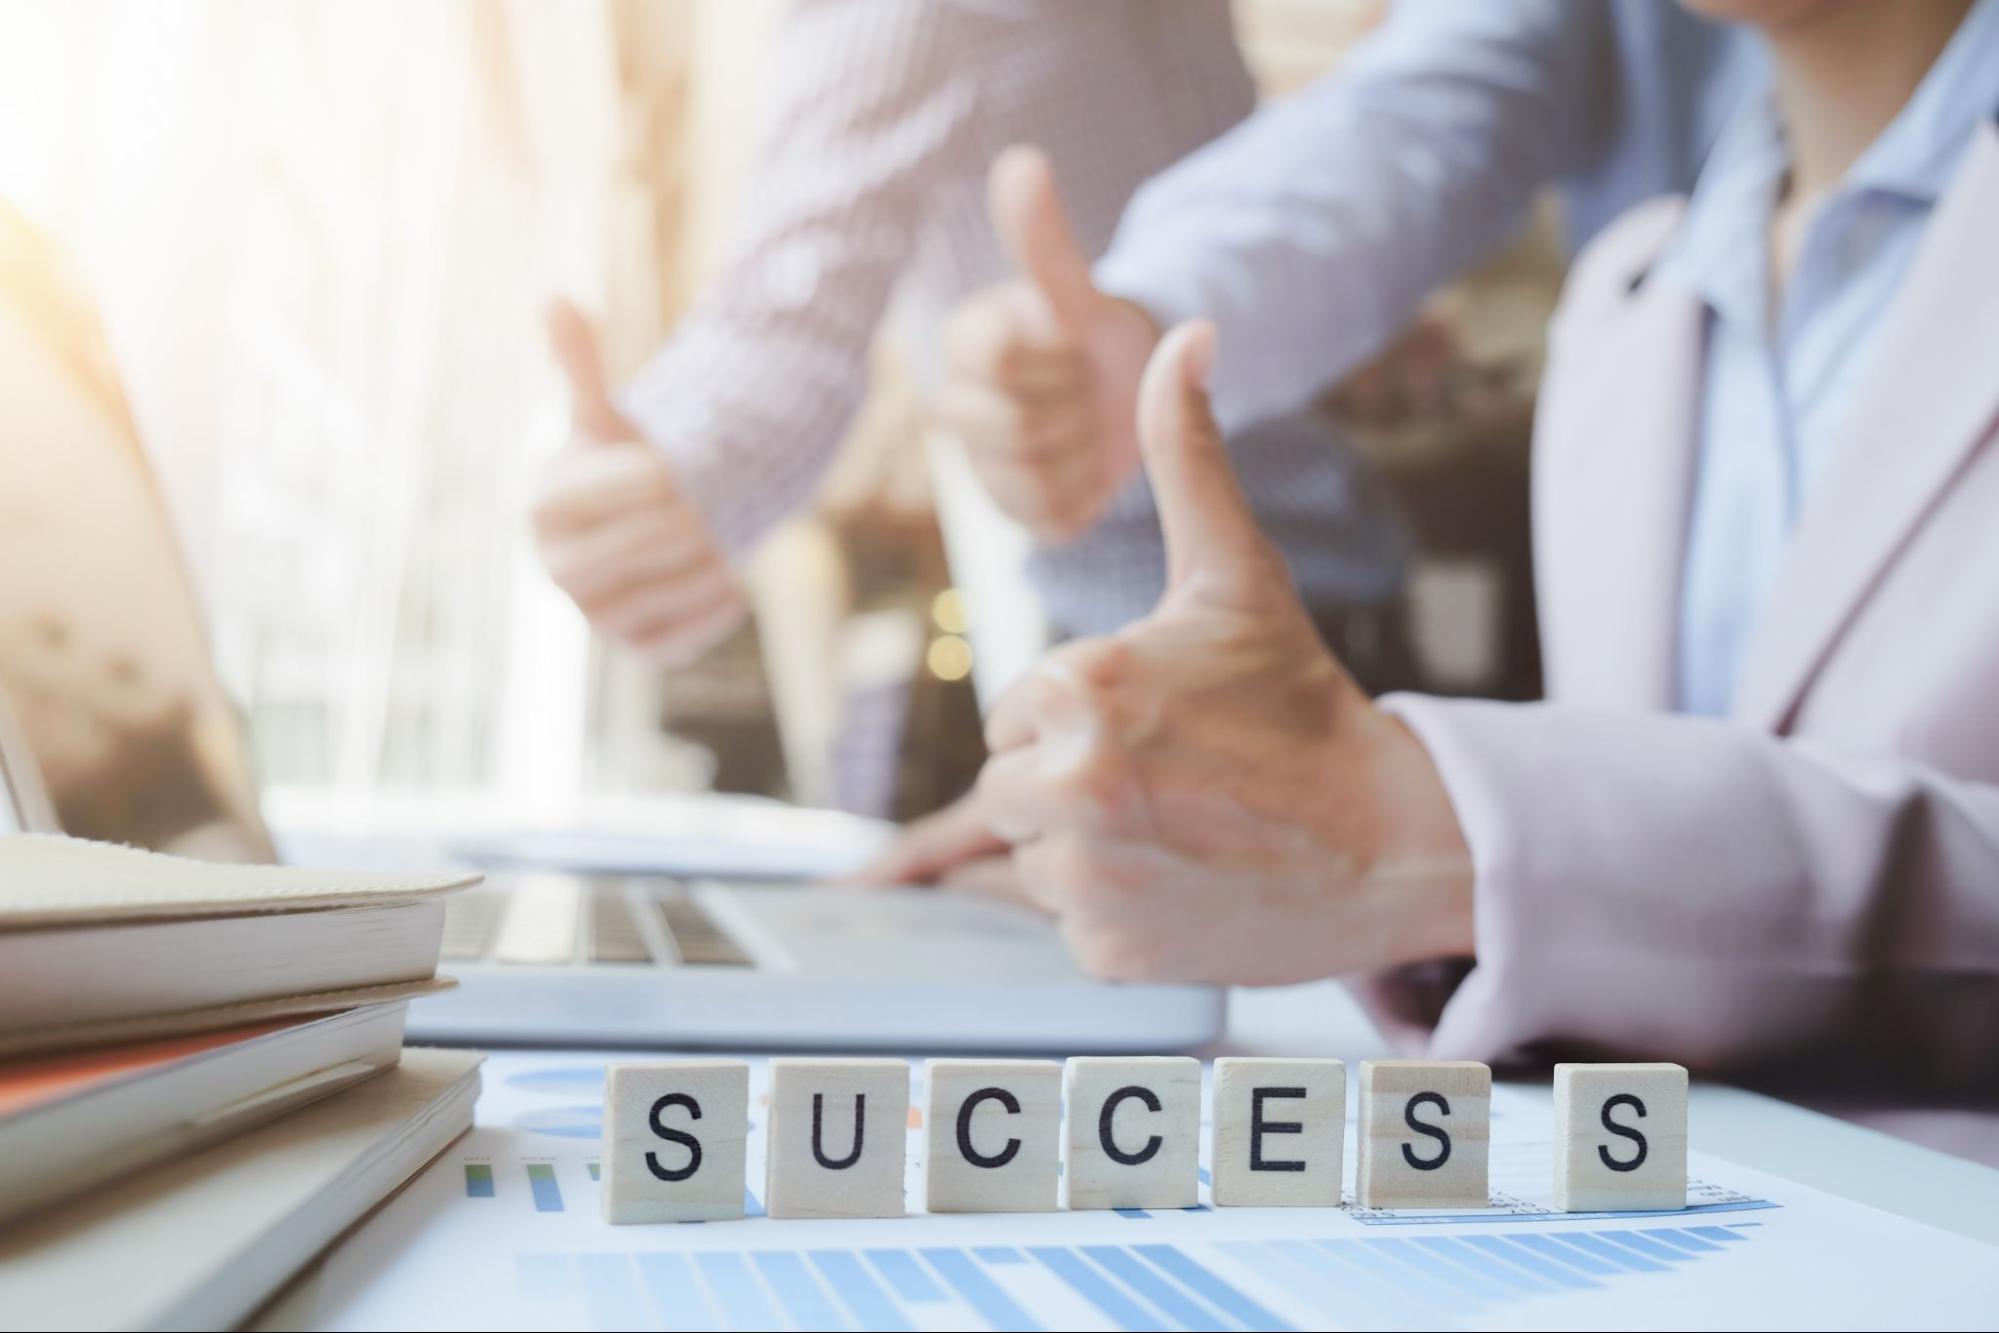 a-poster-saying-success